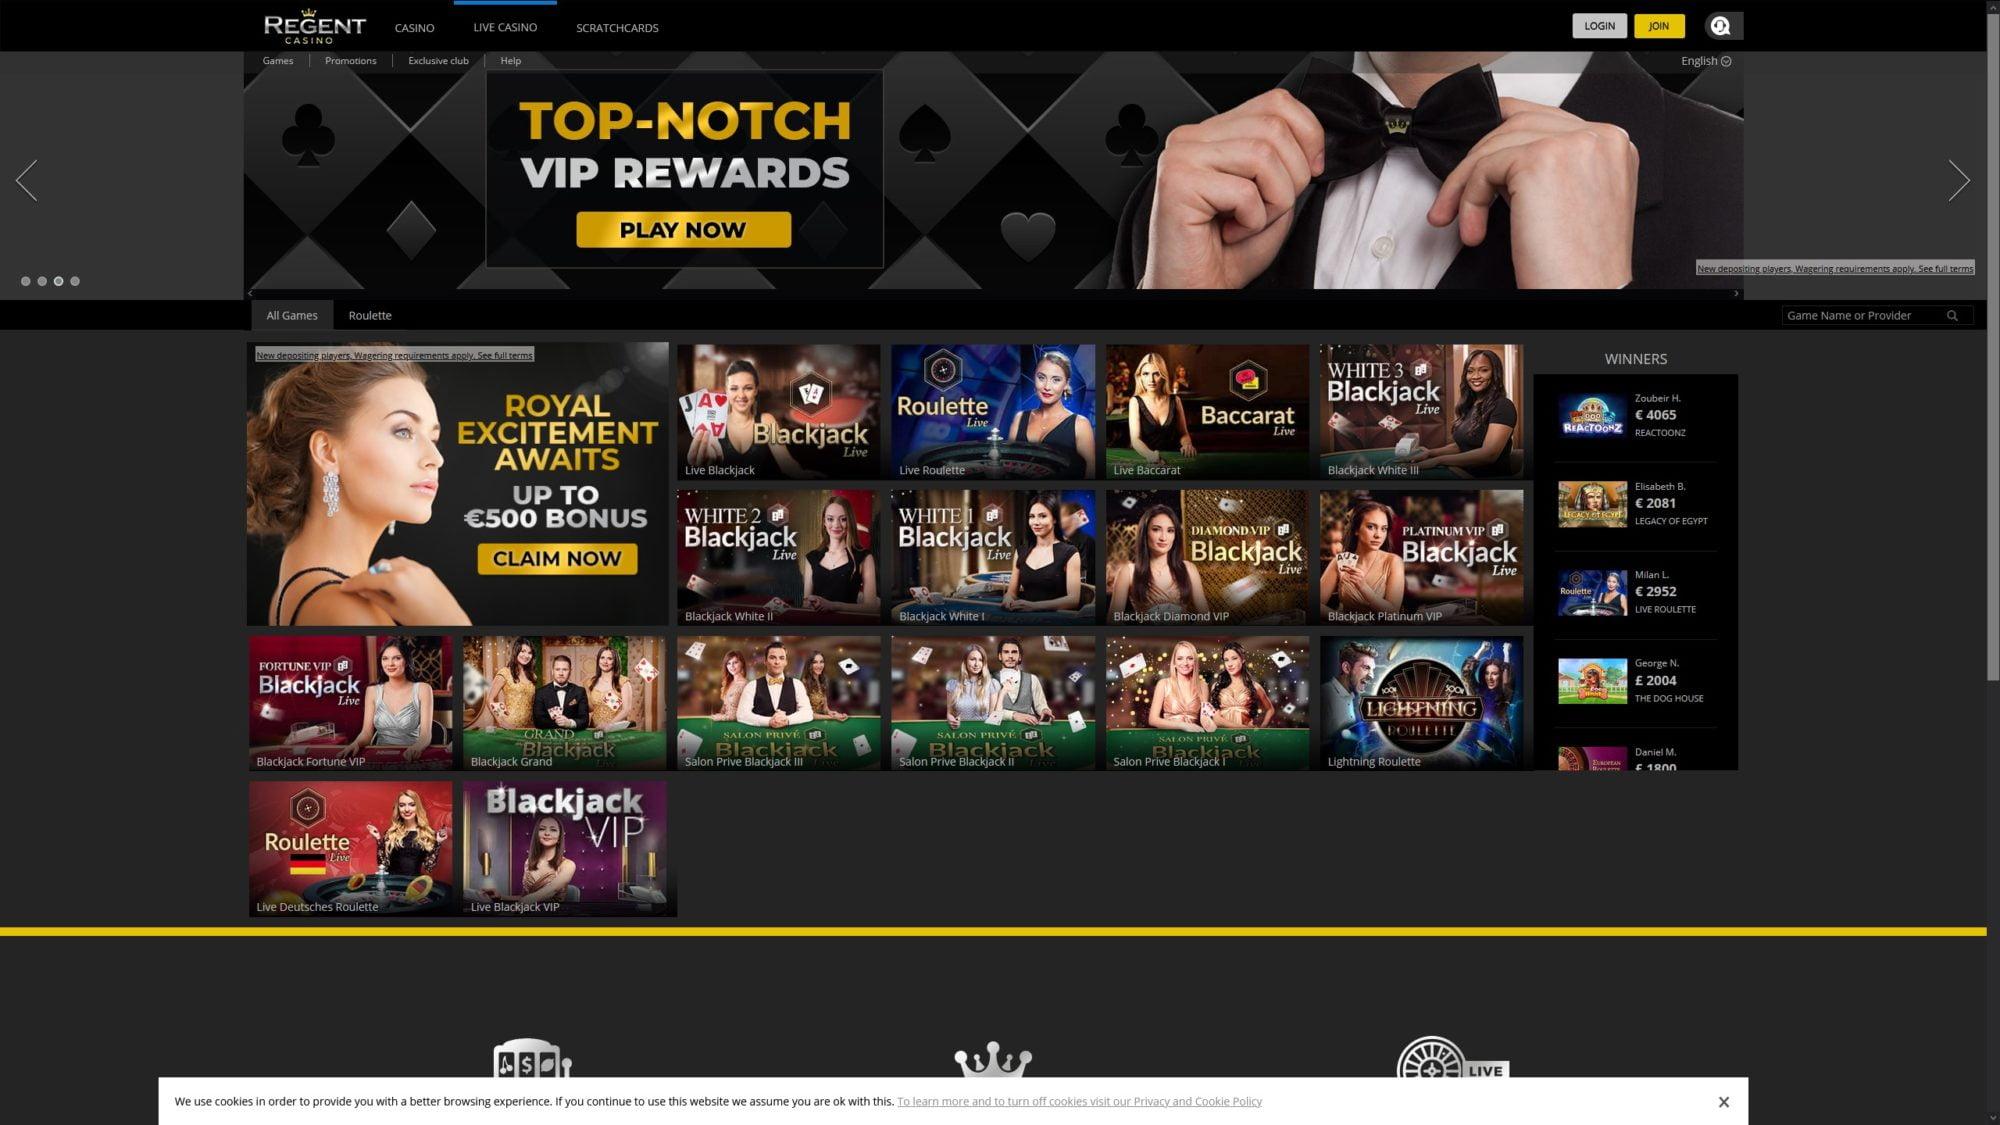 Regent Casino Offers Live Casino